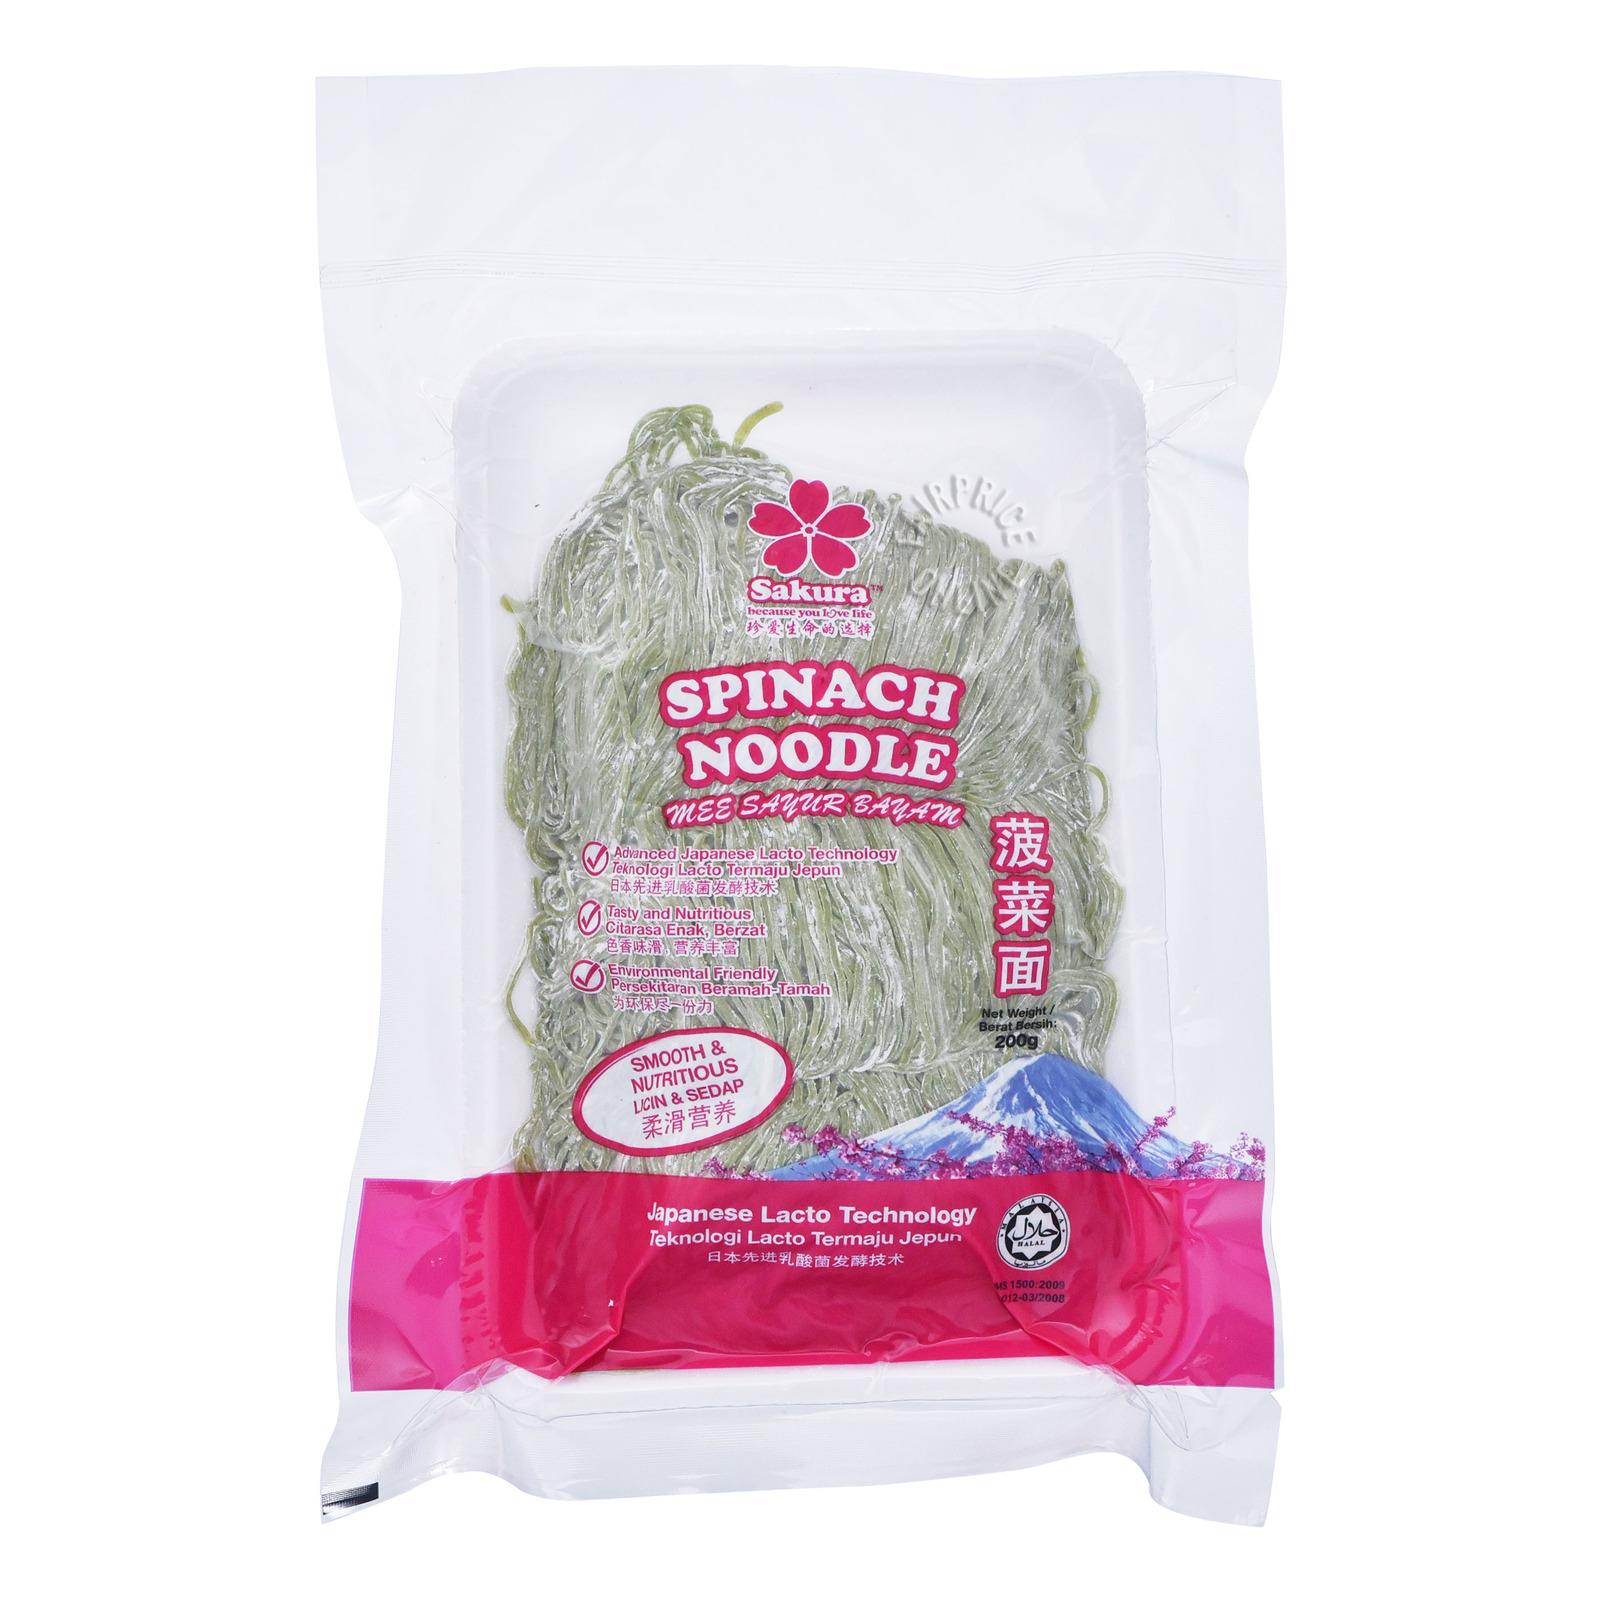 Sakura Spinach Noodle